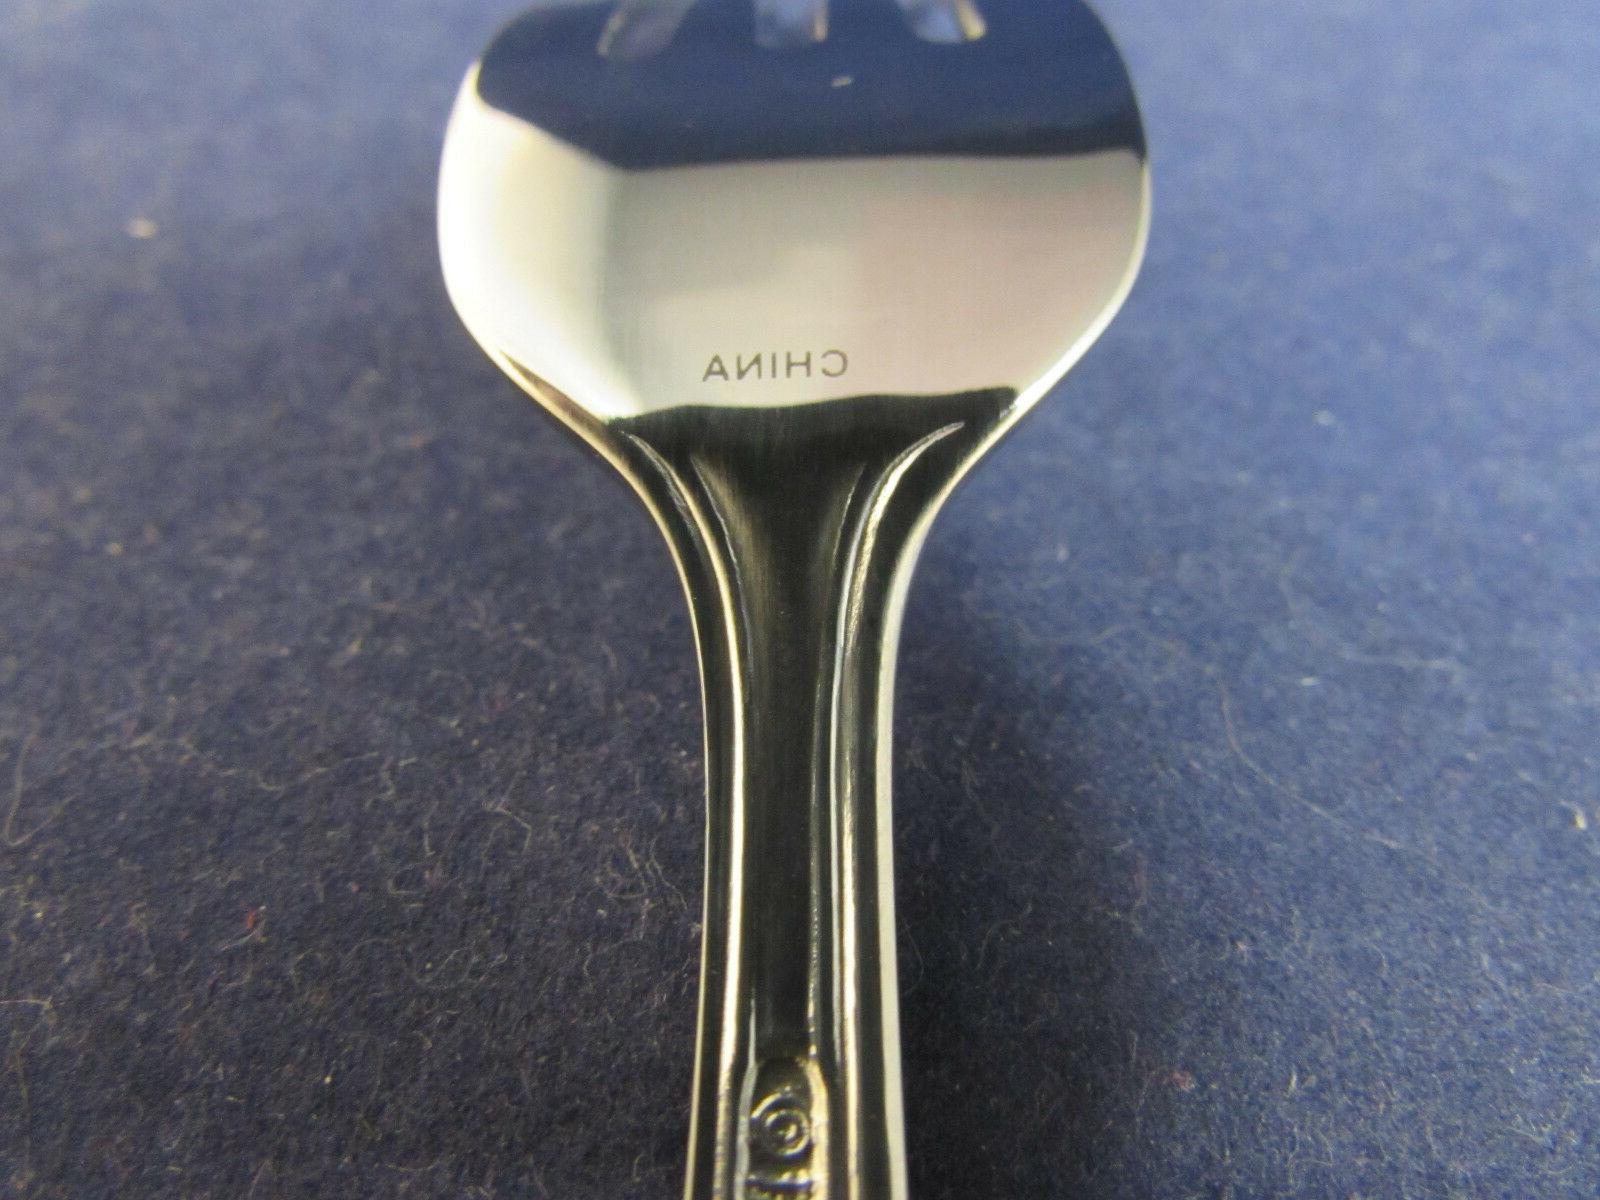 Stainless Silverware NEW